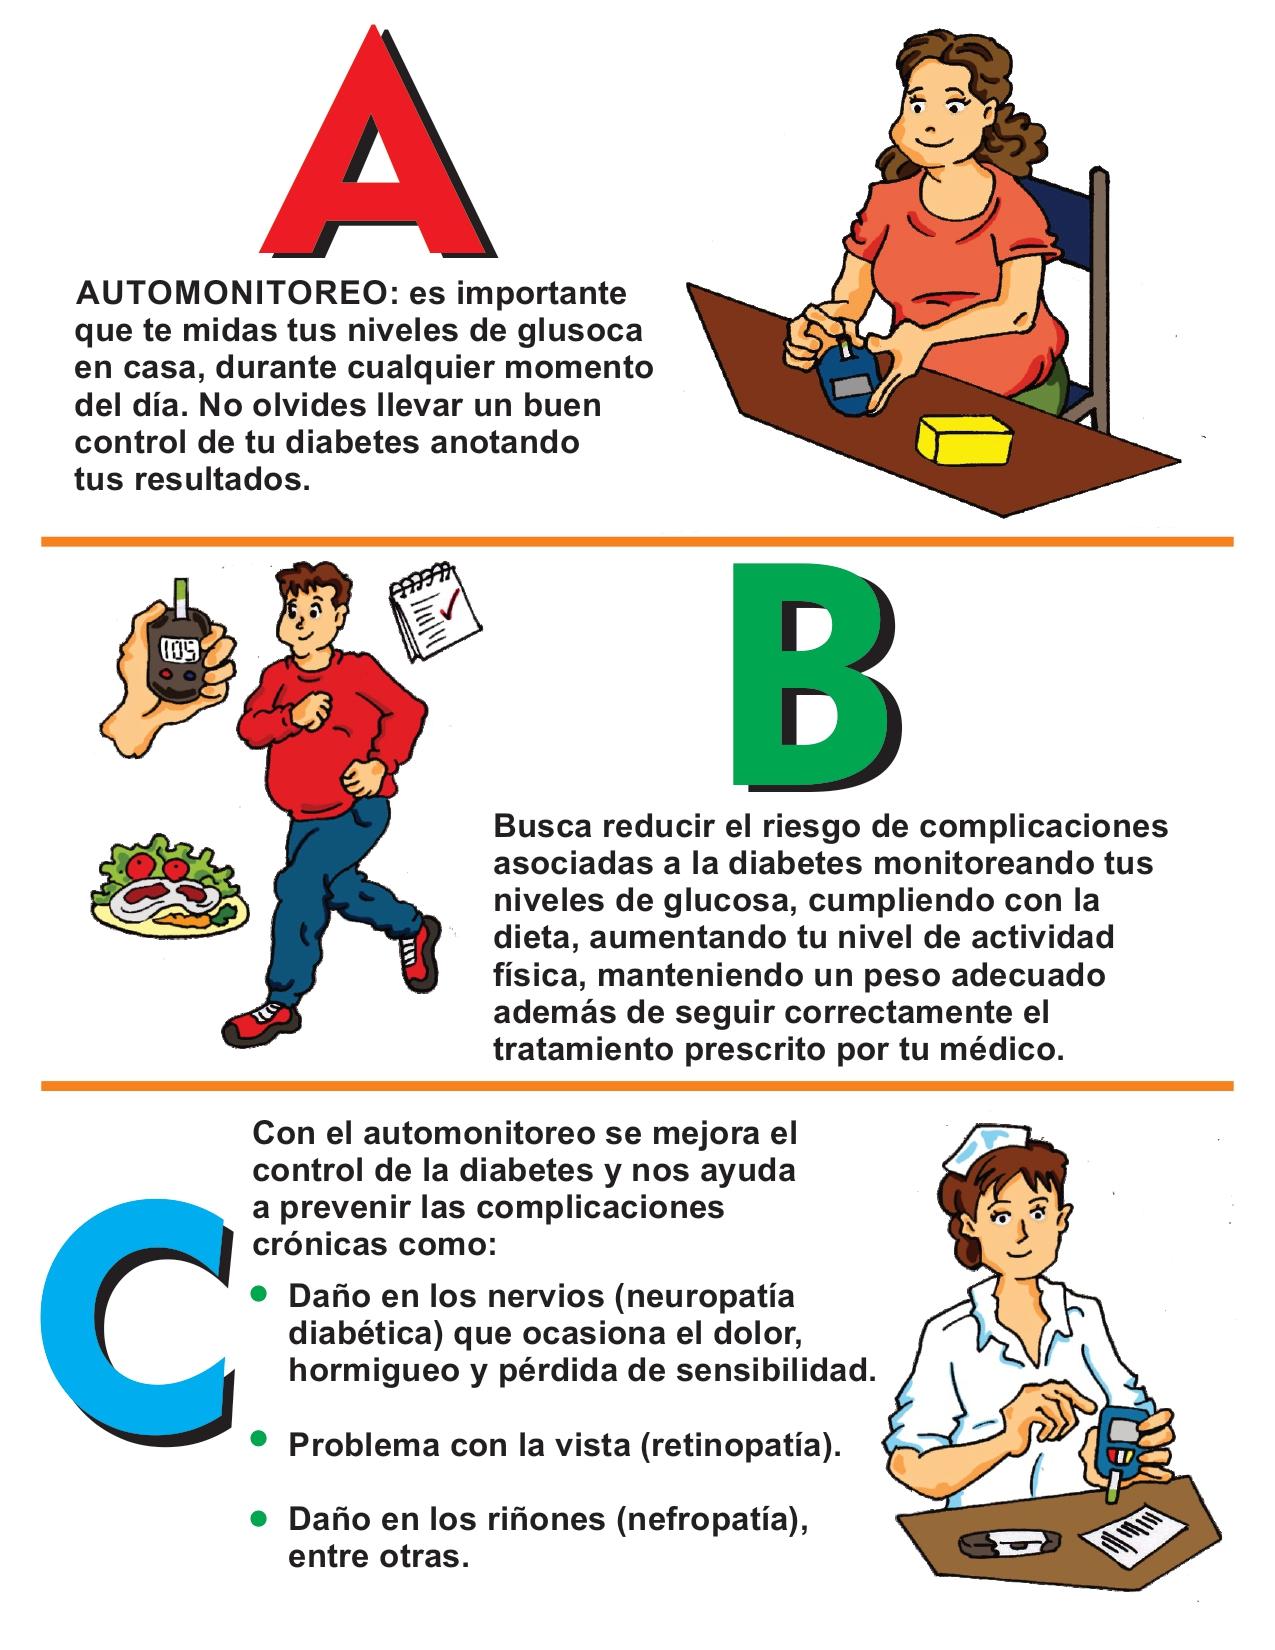 ABC automonitoreo diabetes_pages-to-jpg-0003